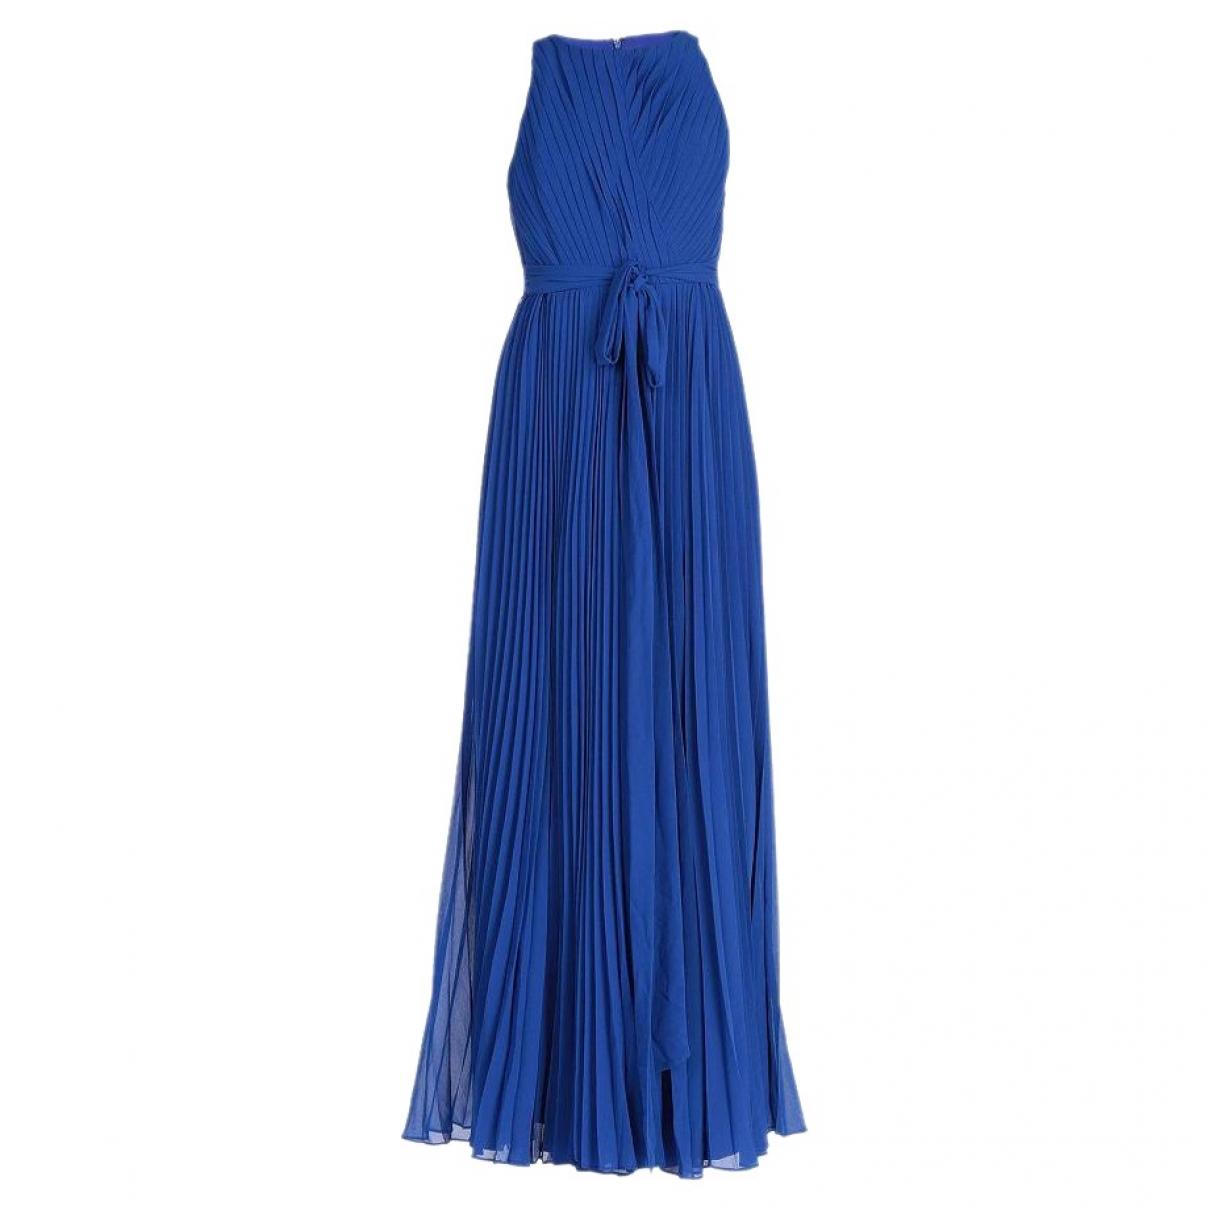 Badgley Mischka \N Kleid in  Blau Polyester